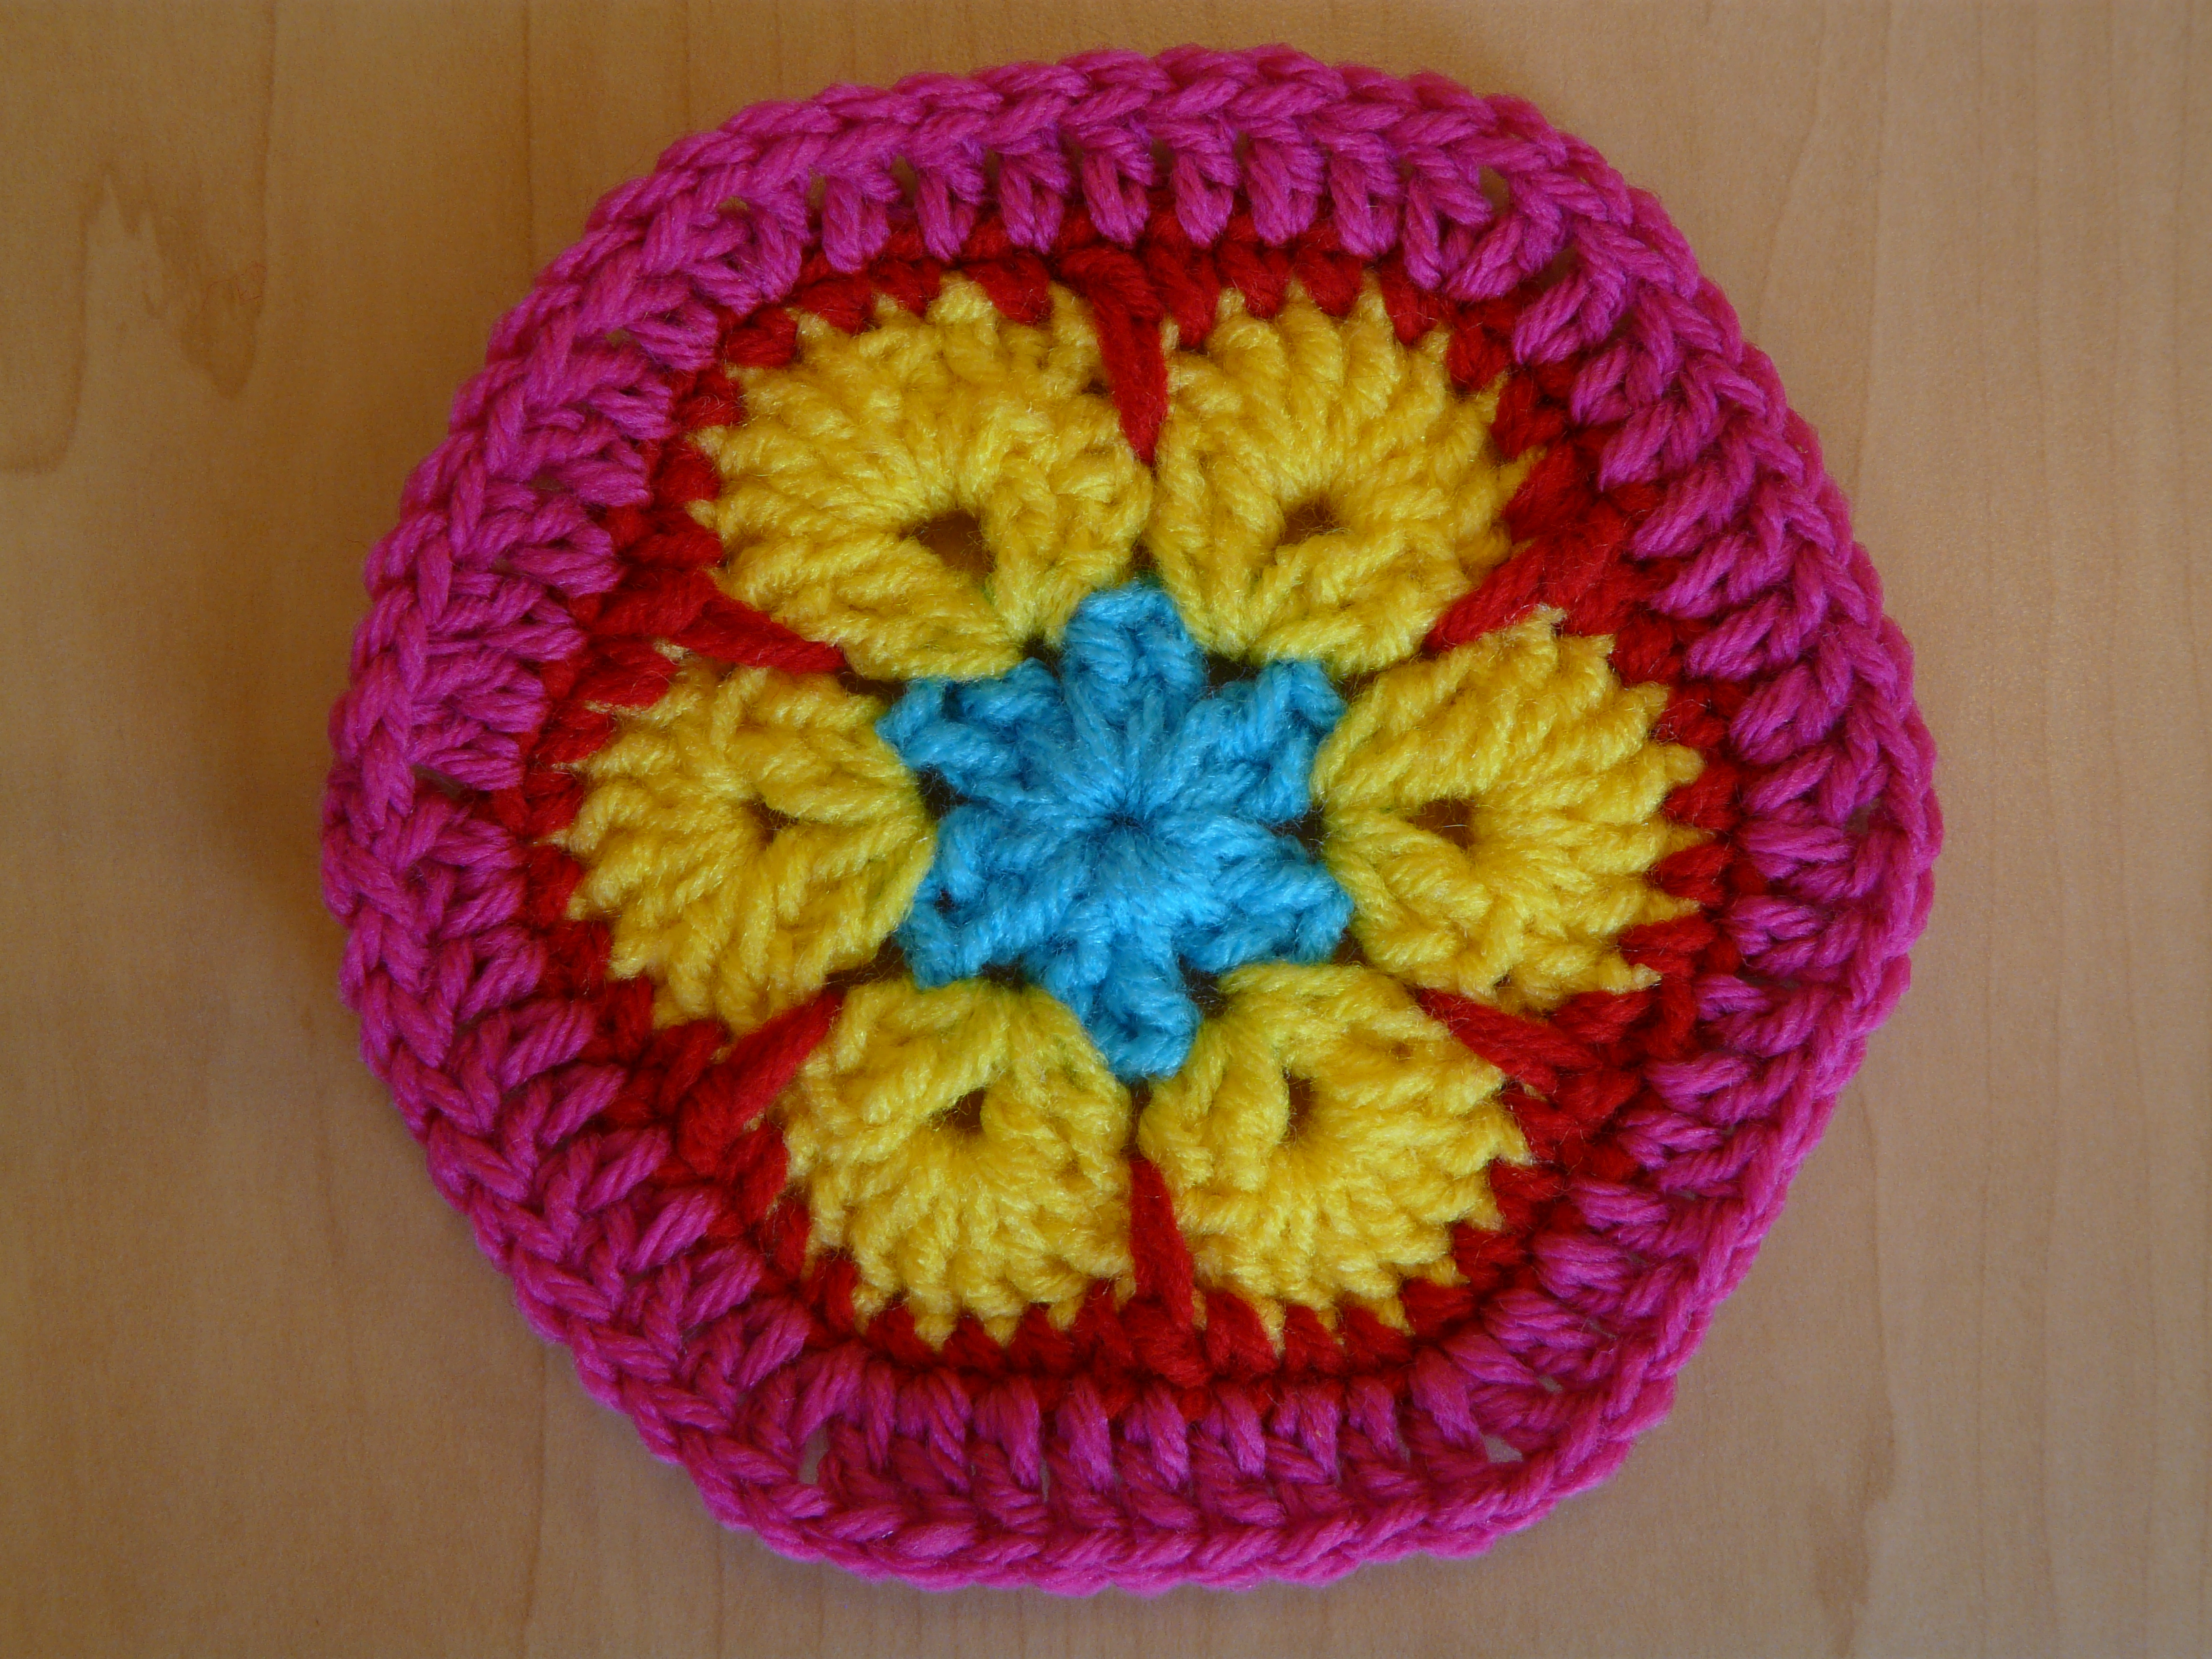 African Flower Crochet Pattern Half : african flower half hexagon Archives - Crochetbug